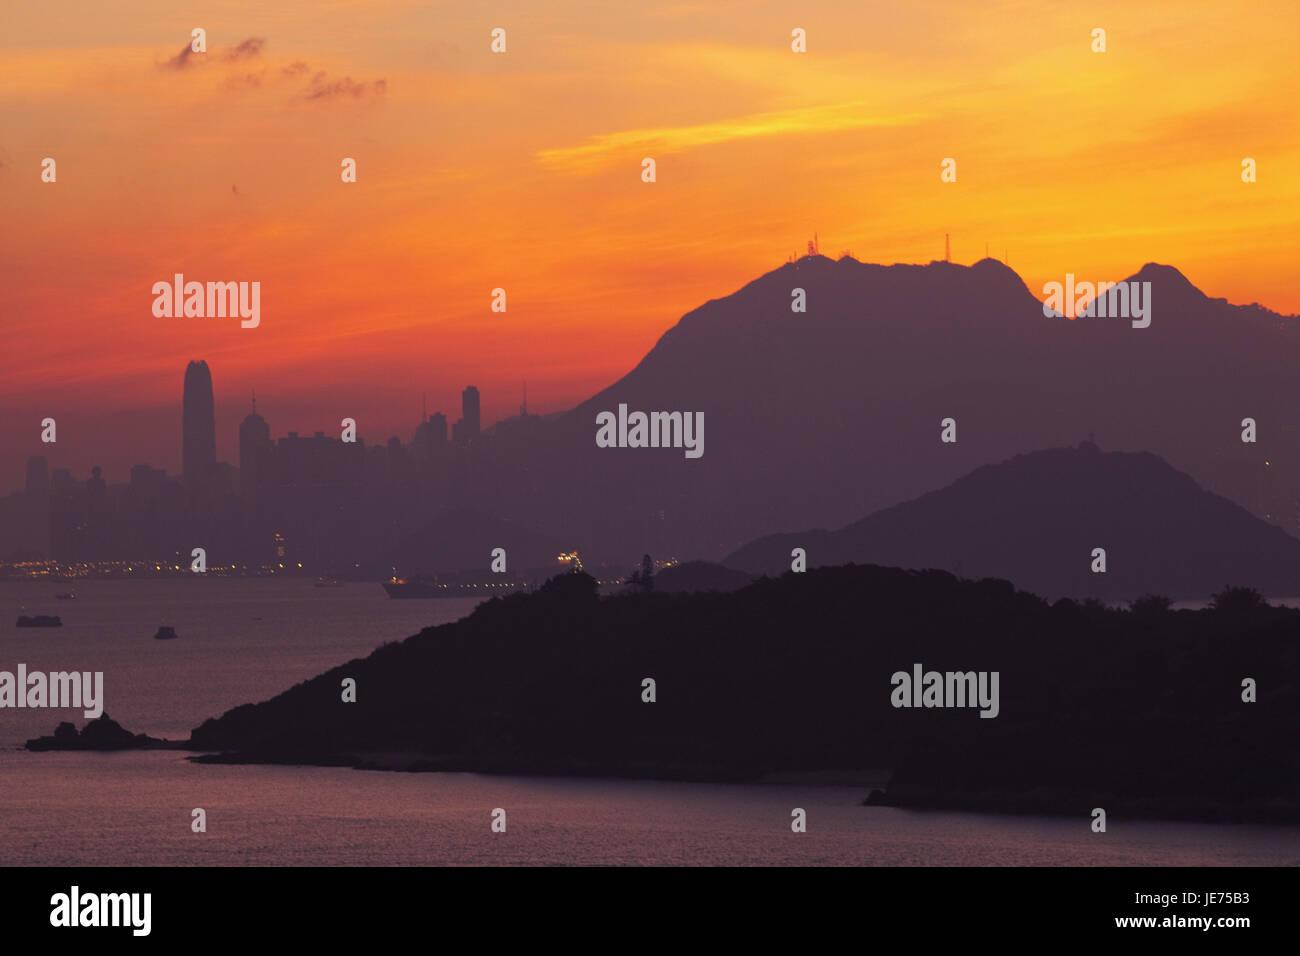 China, Hong Kong, skyline with Victoria Peak, view of Lantau Iceland with daybreak, - Stock Image